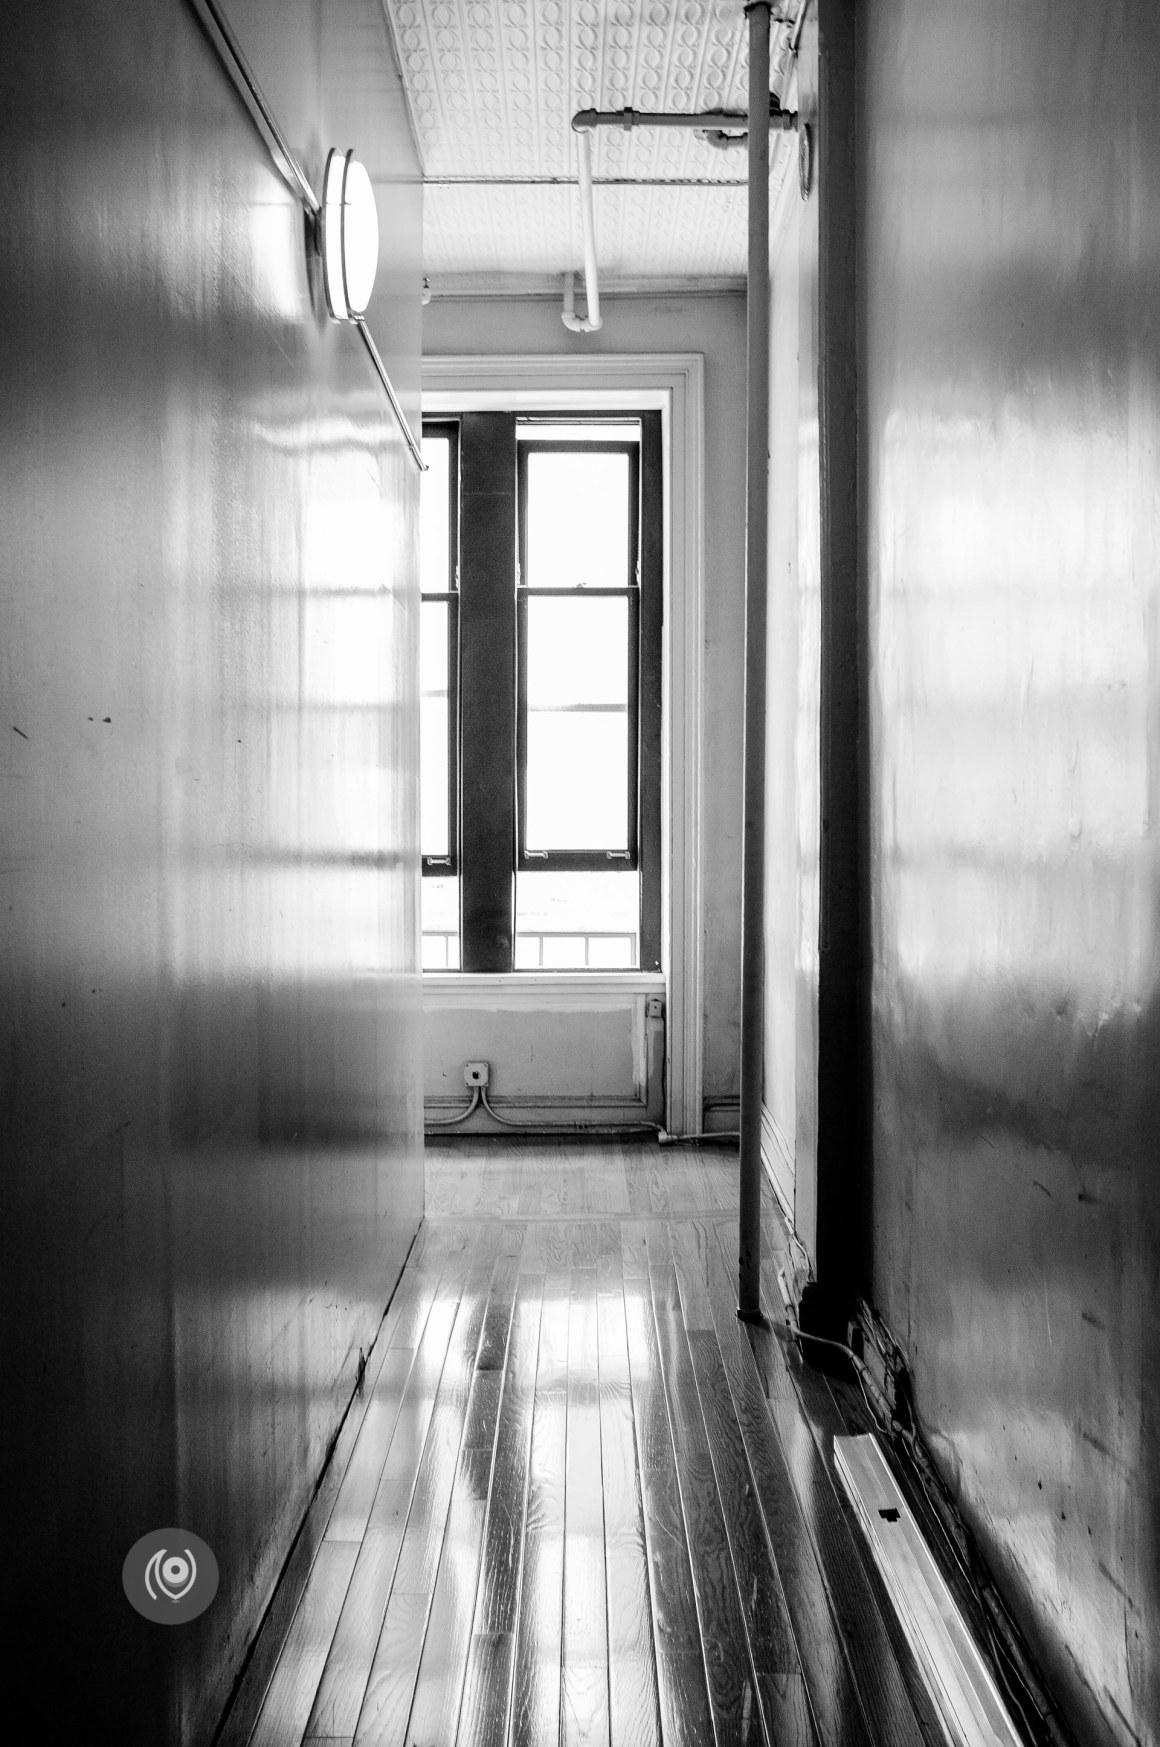 Negative Underwear #EyesForNewYork #REDHUxNYC Naina.co Luxury & Lifestyle, Photographer Storyteller, Blogger